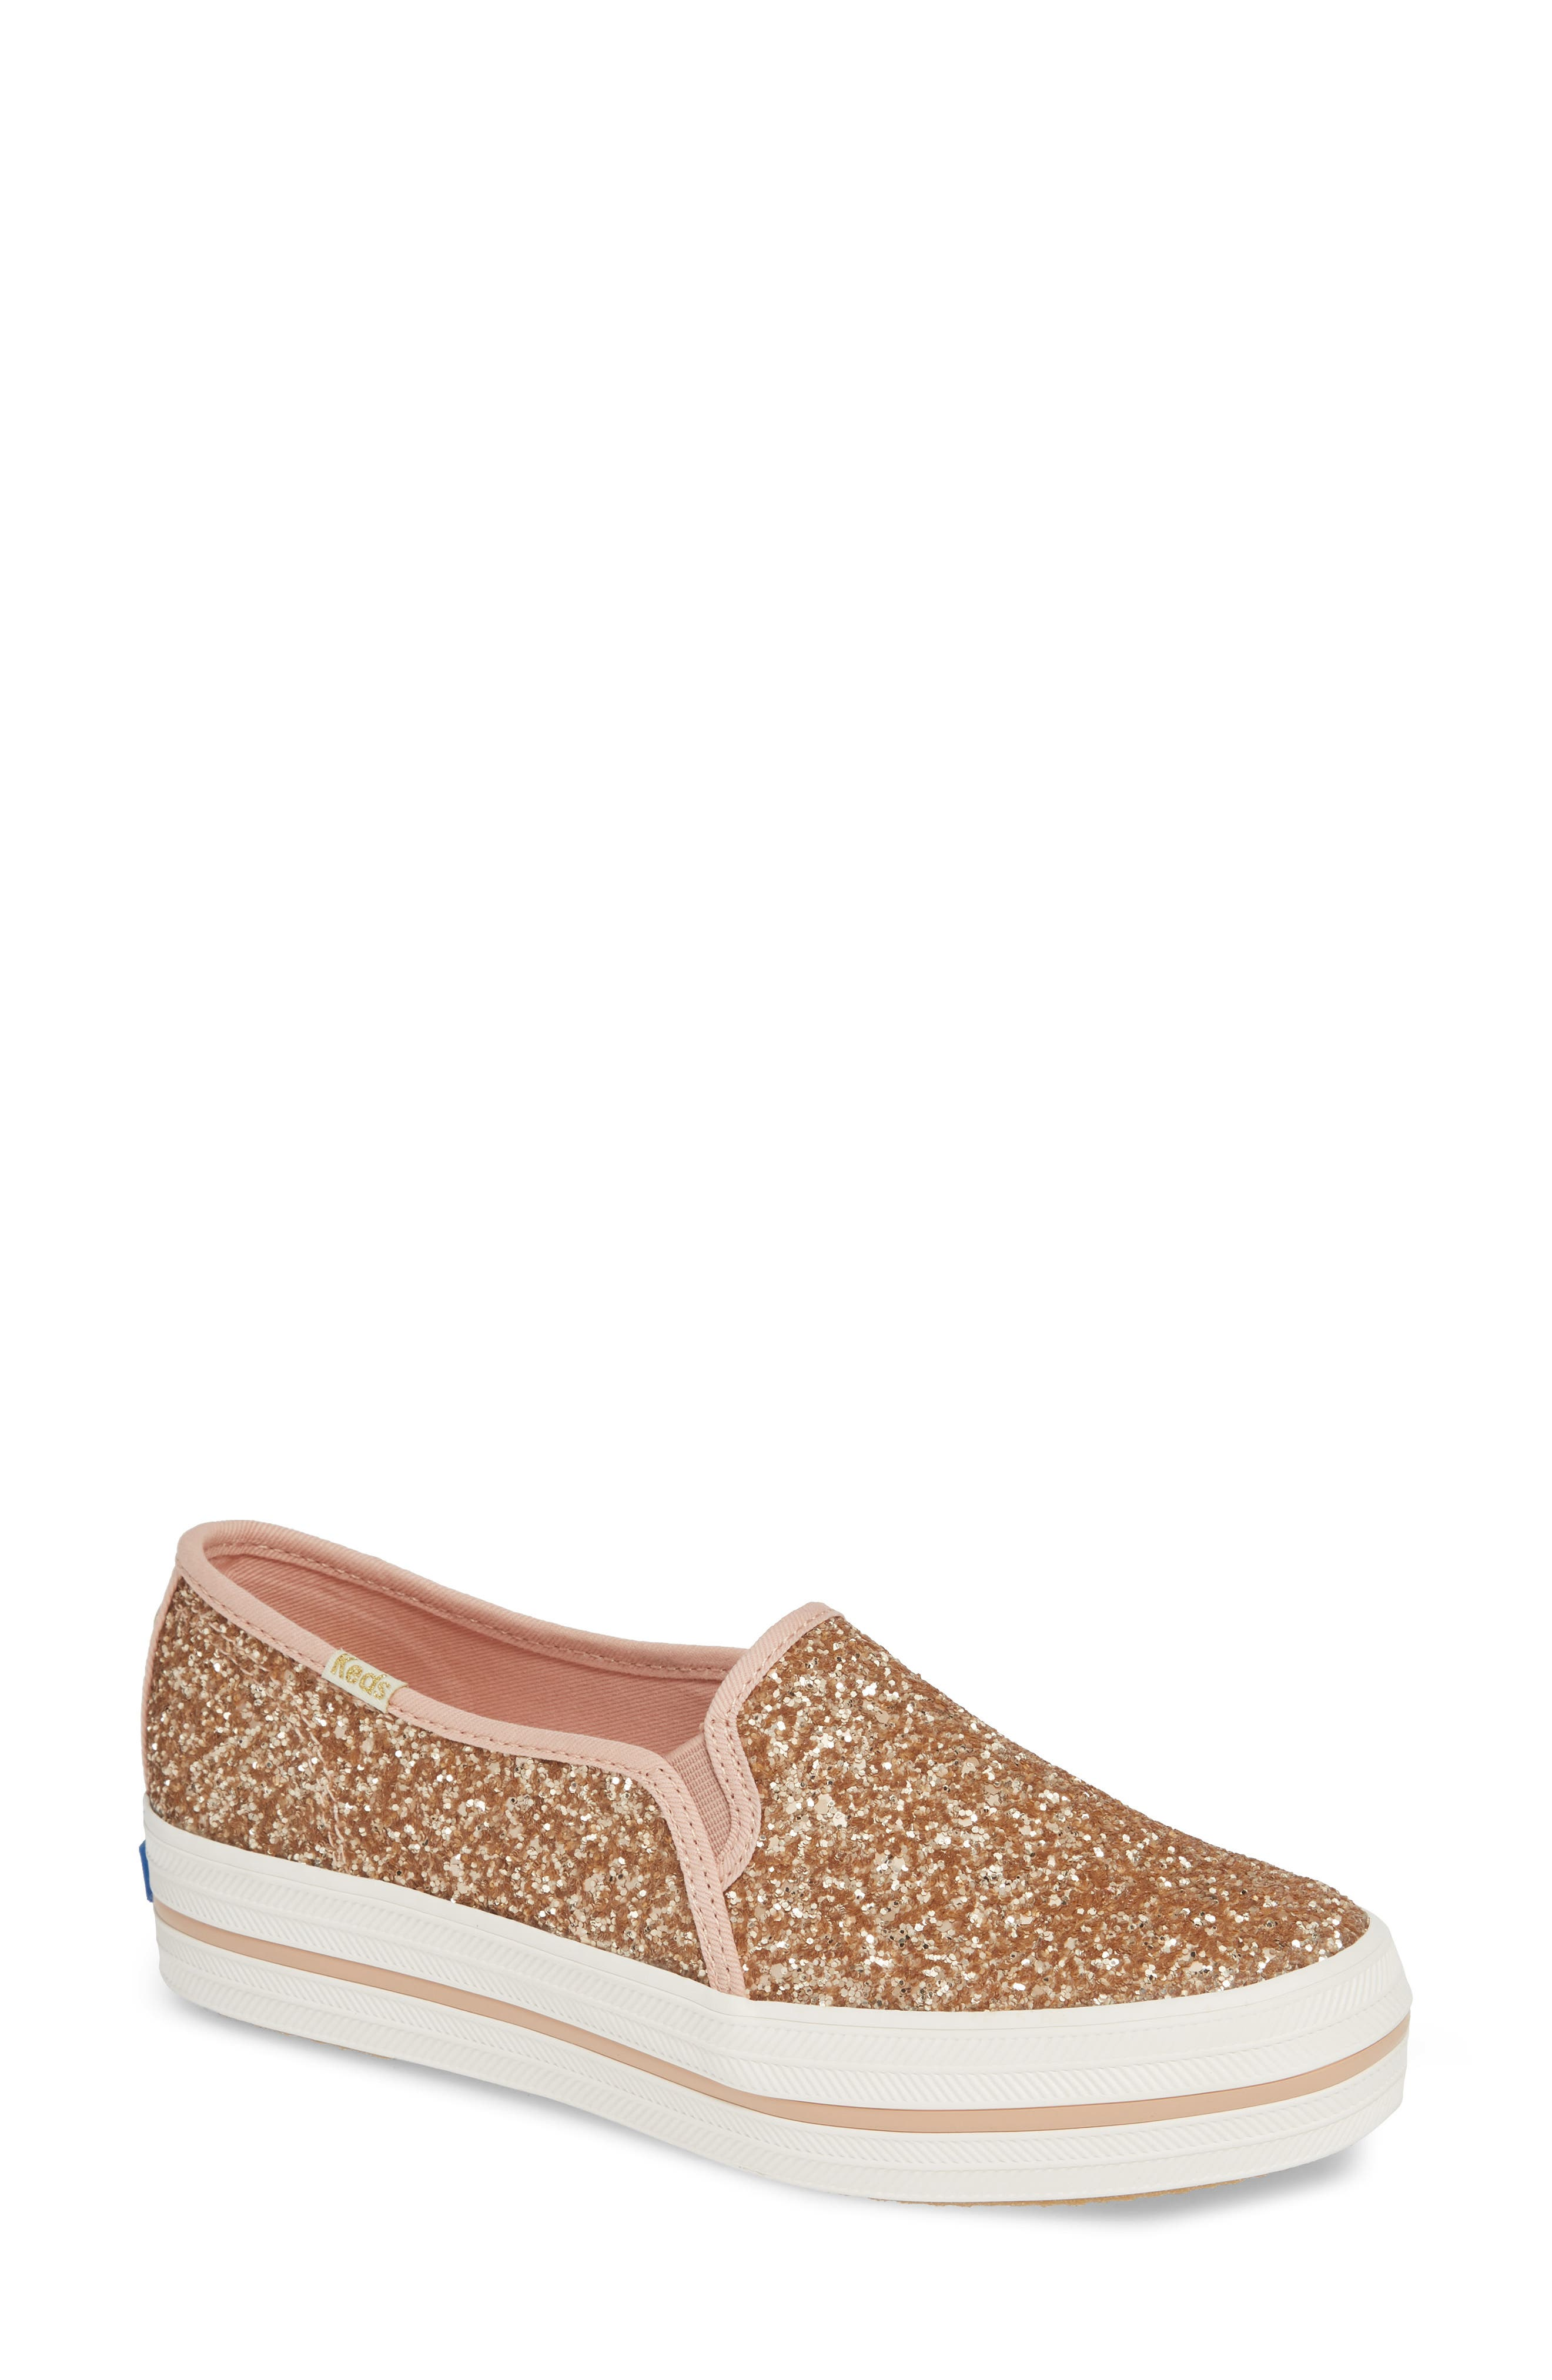 KEDS<SUP>®</SUP> FOR KATE SPADE NEW YORK triple decker glitter slip-on sneaker, Main, color, ROSE GOLD